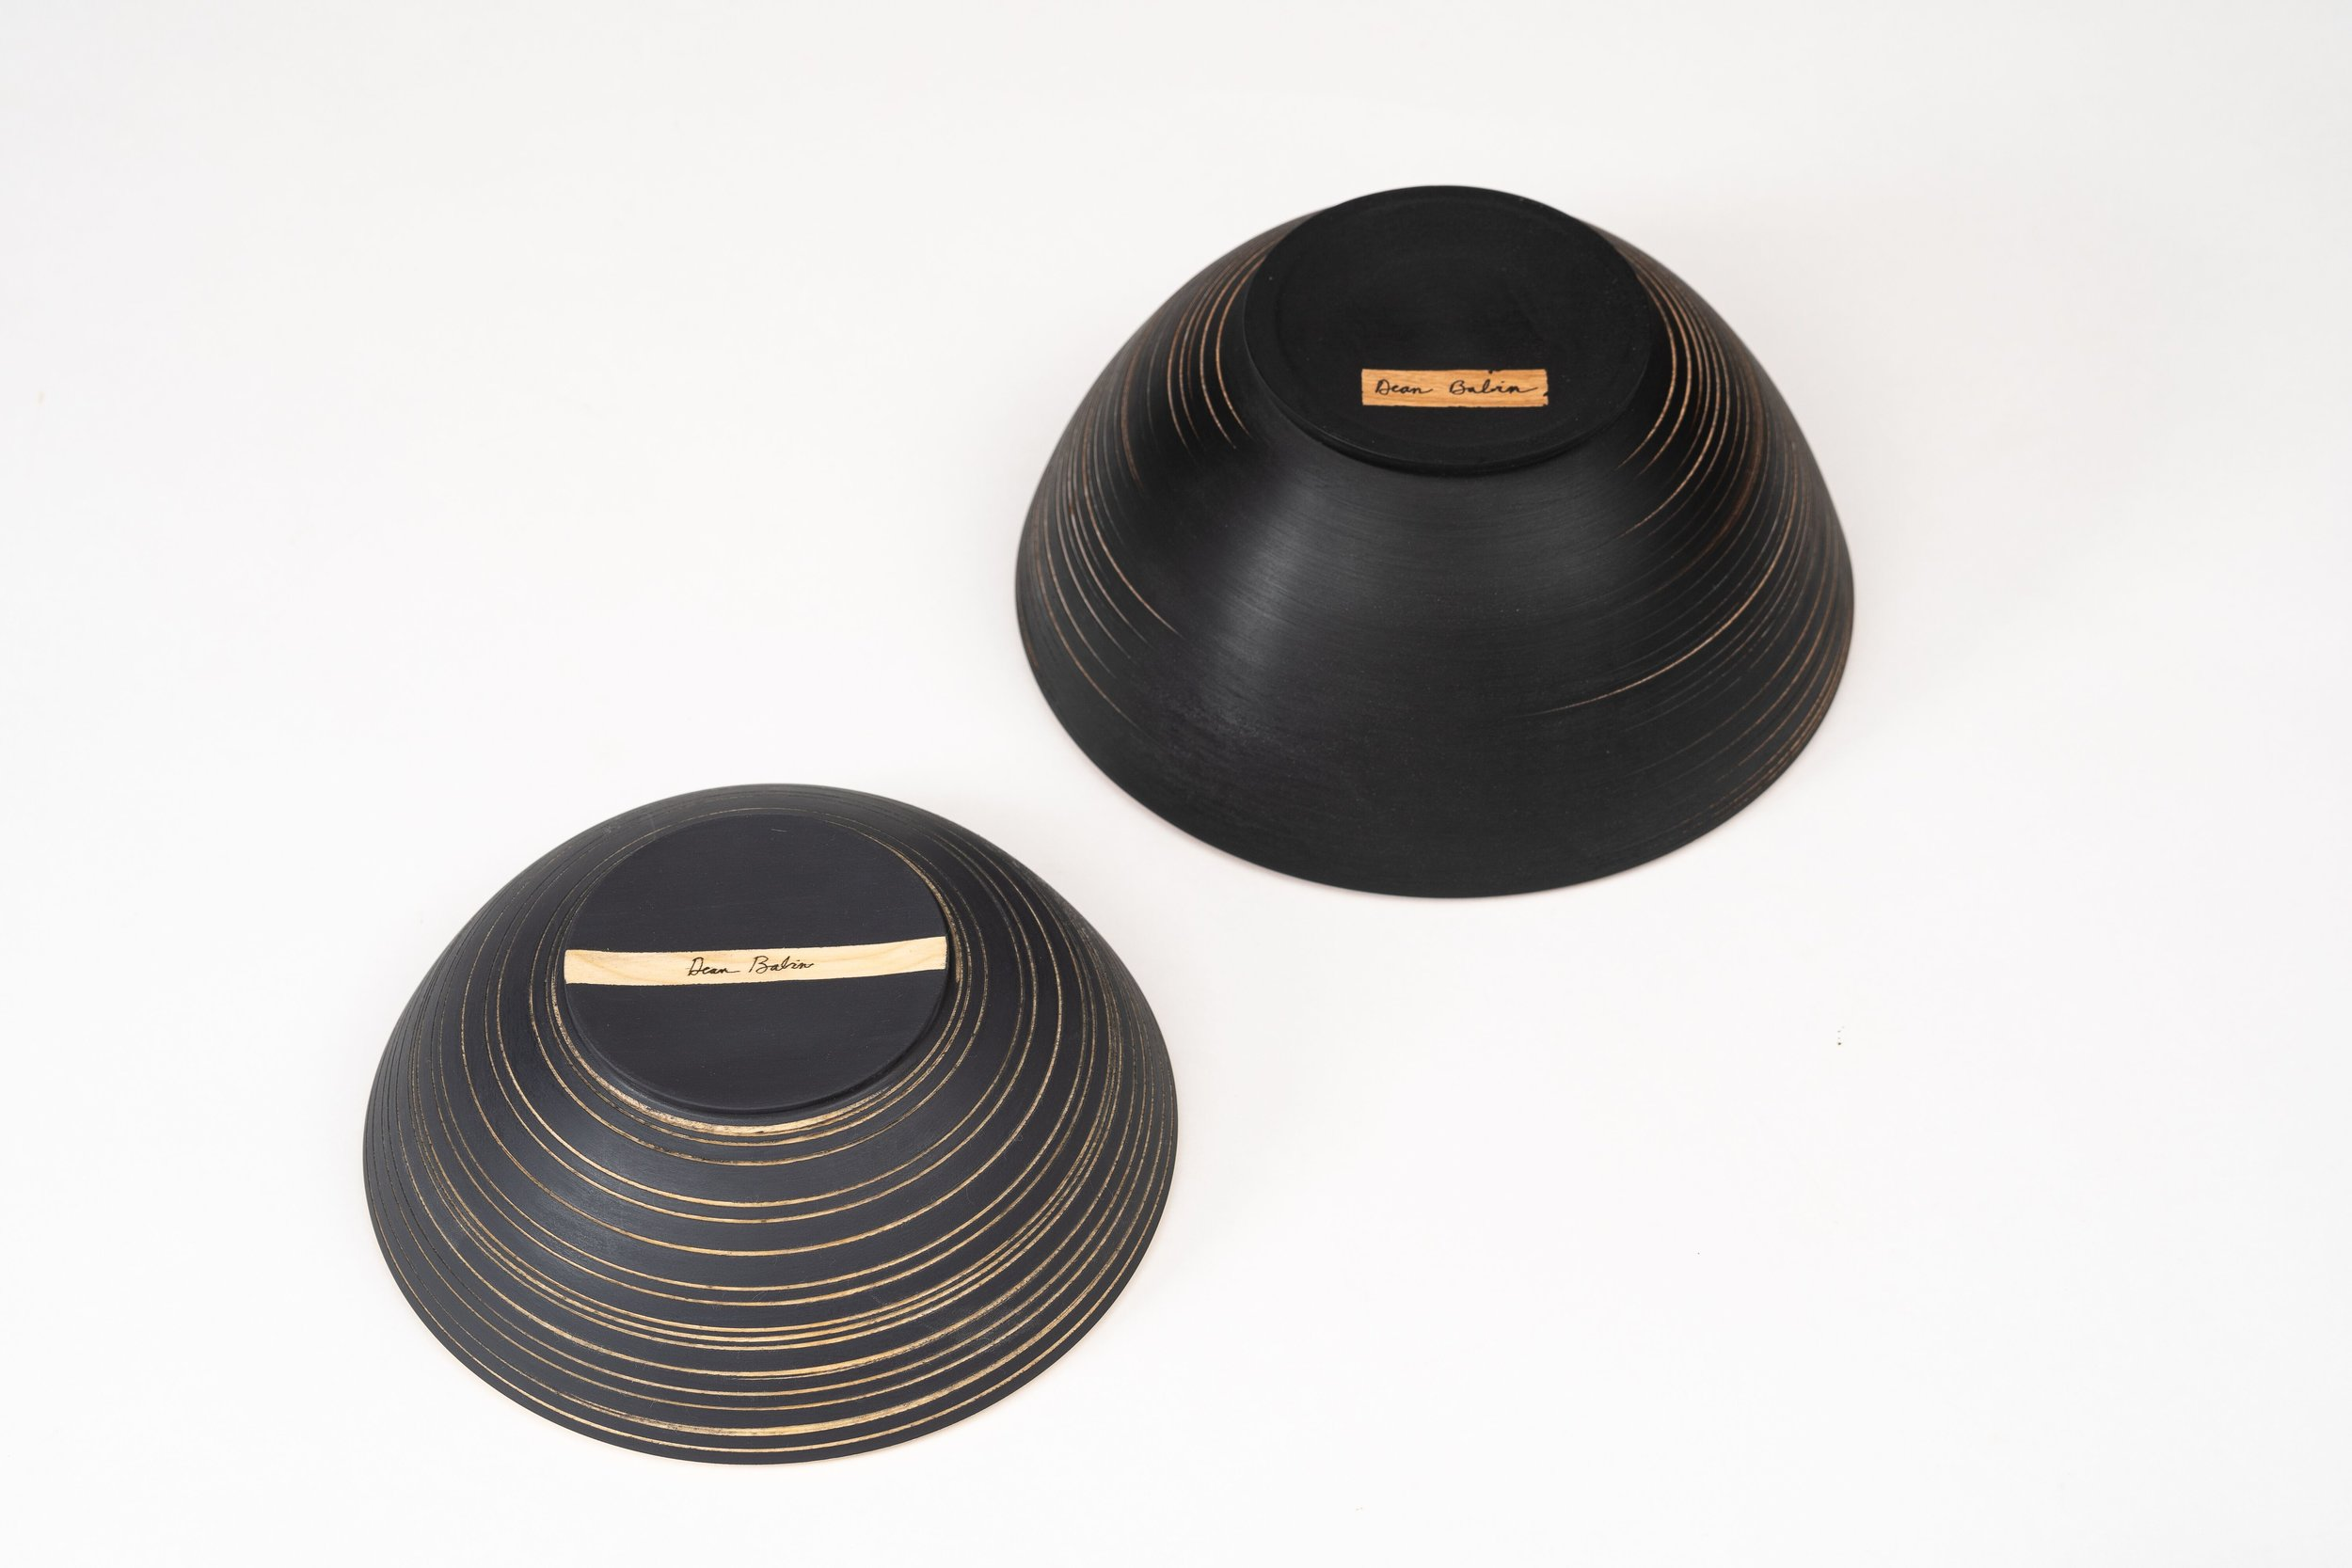 dean-babin-hand-crafted-ny-wooden-salad-bowls.jpeg